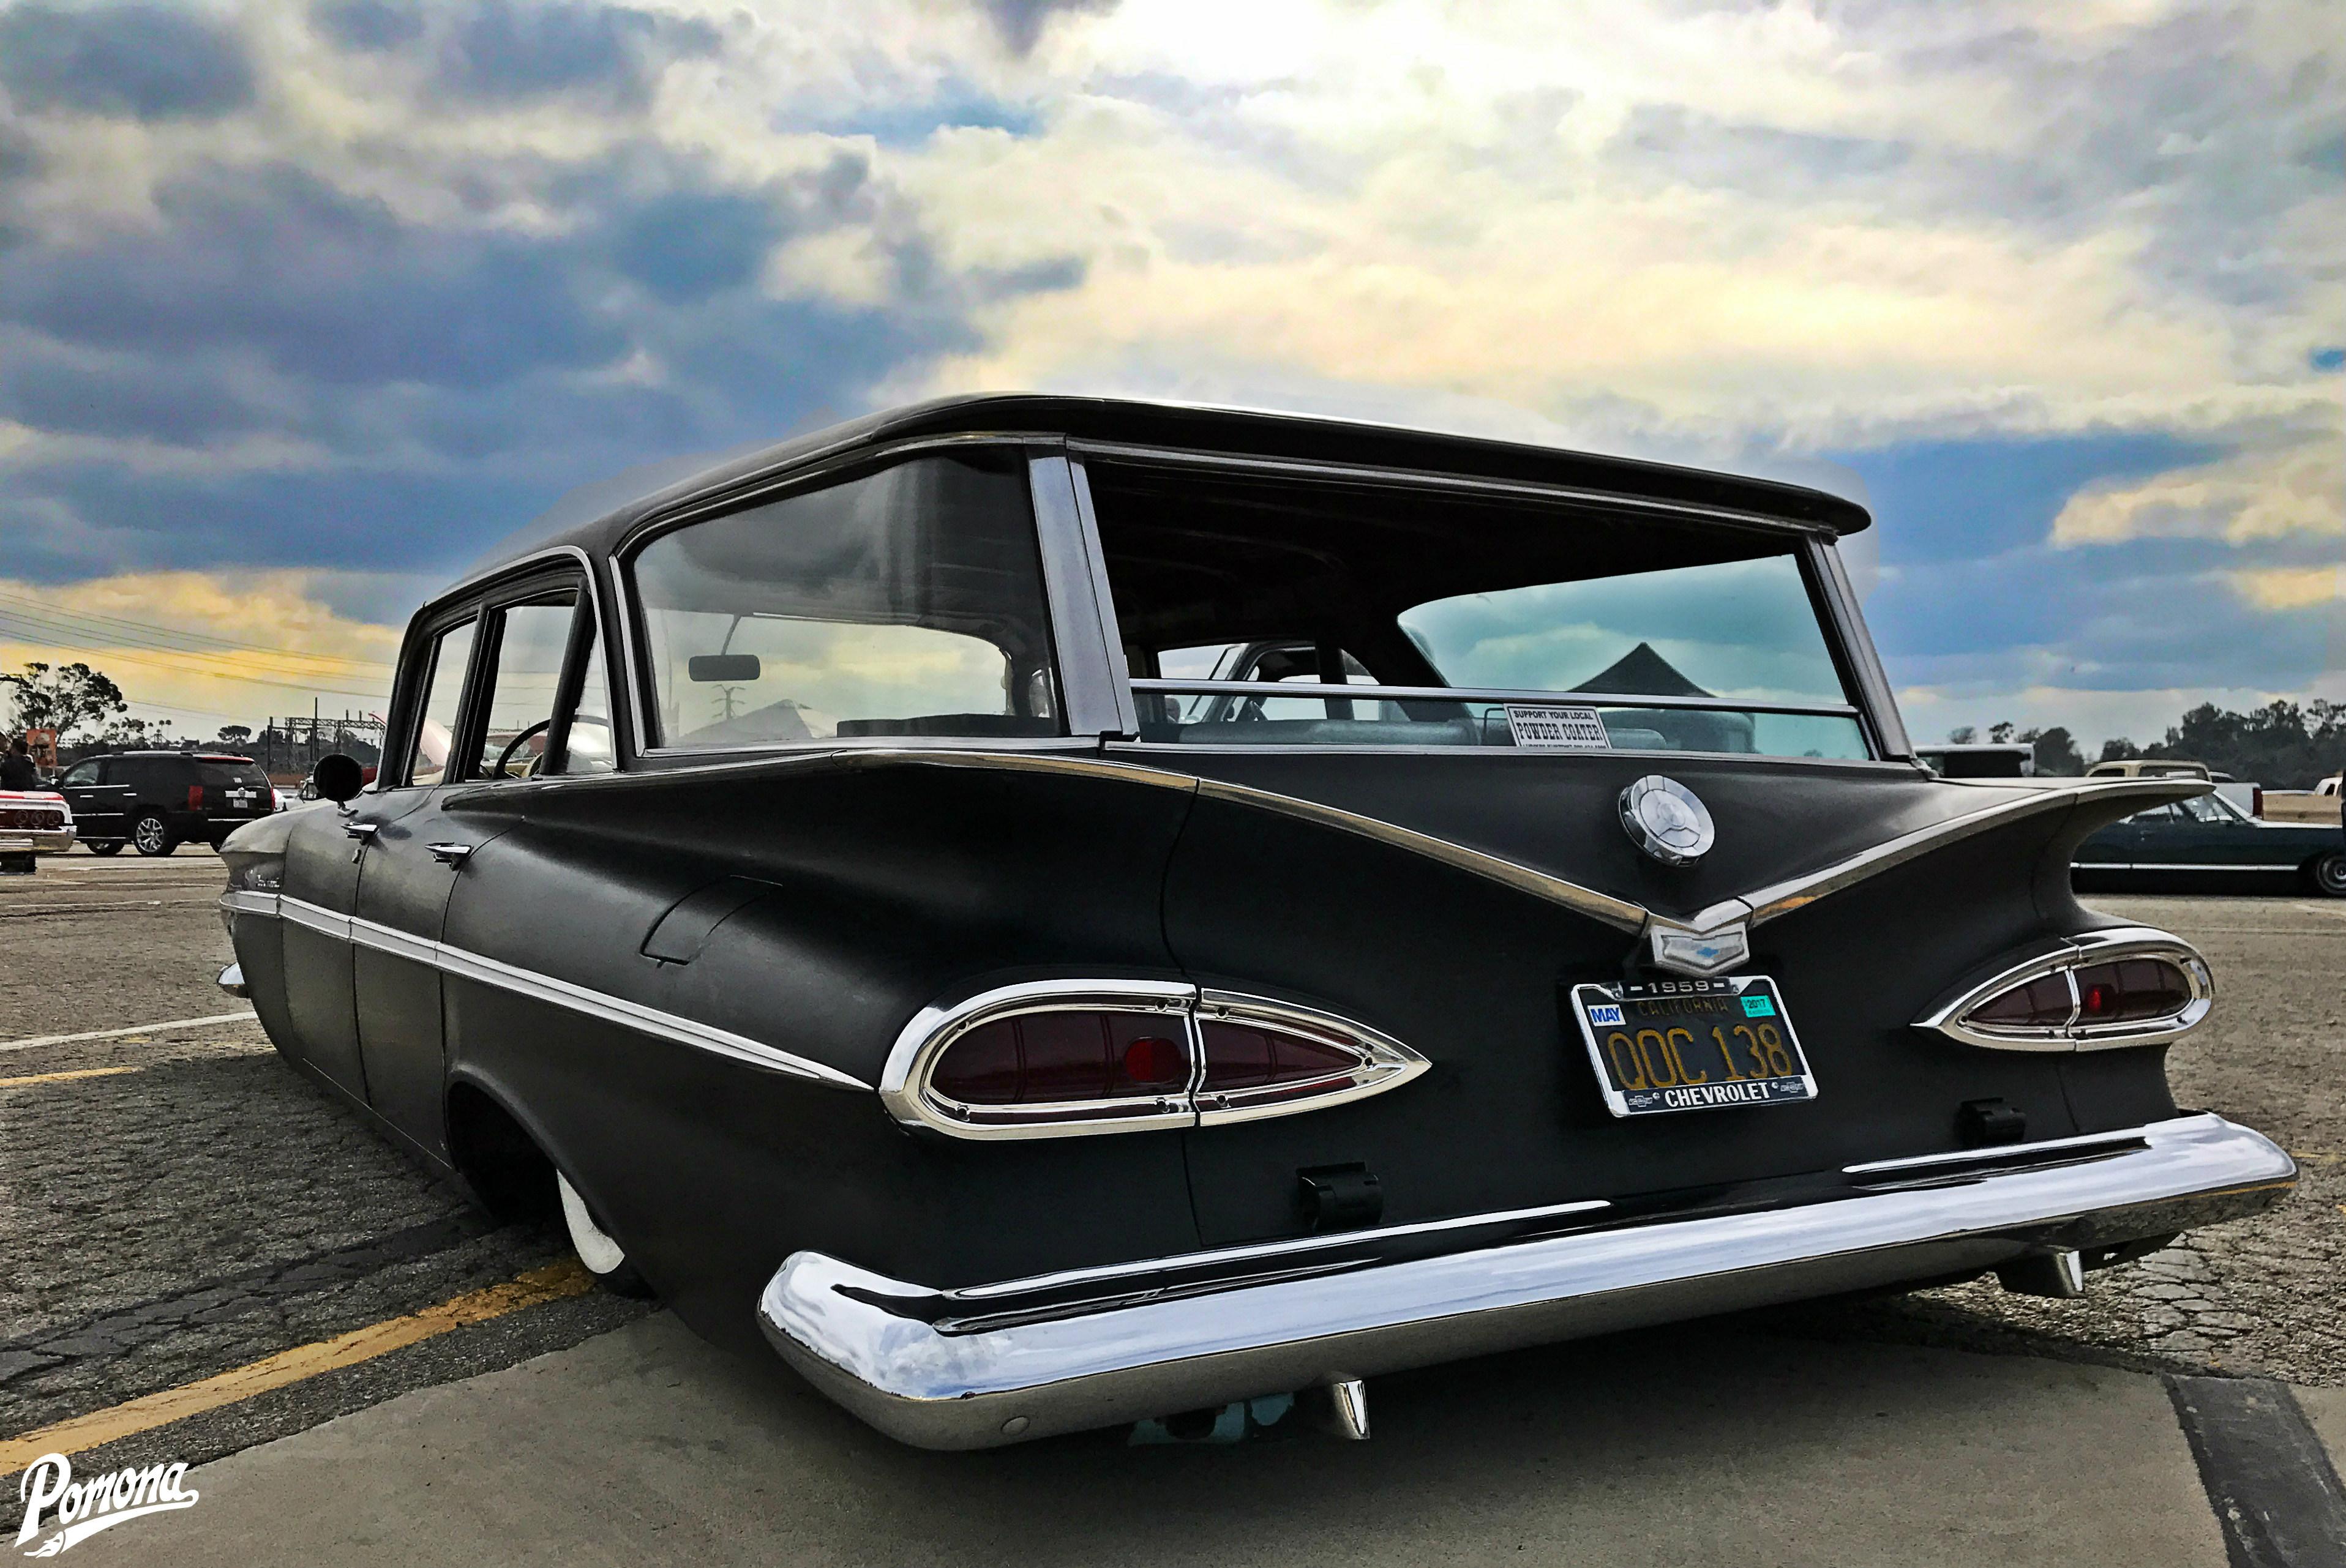 1959 Chevy Station Wagon